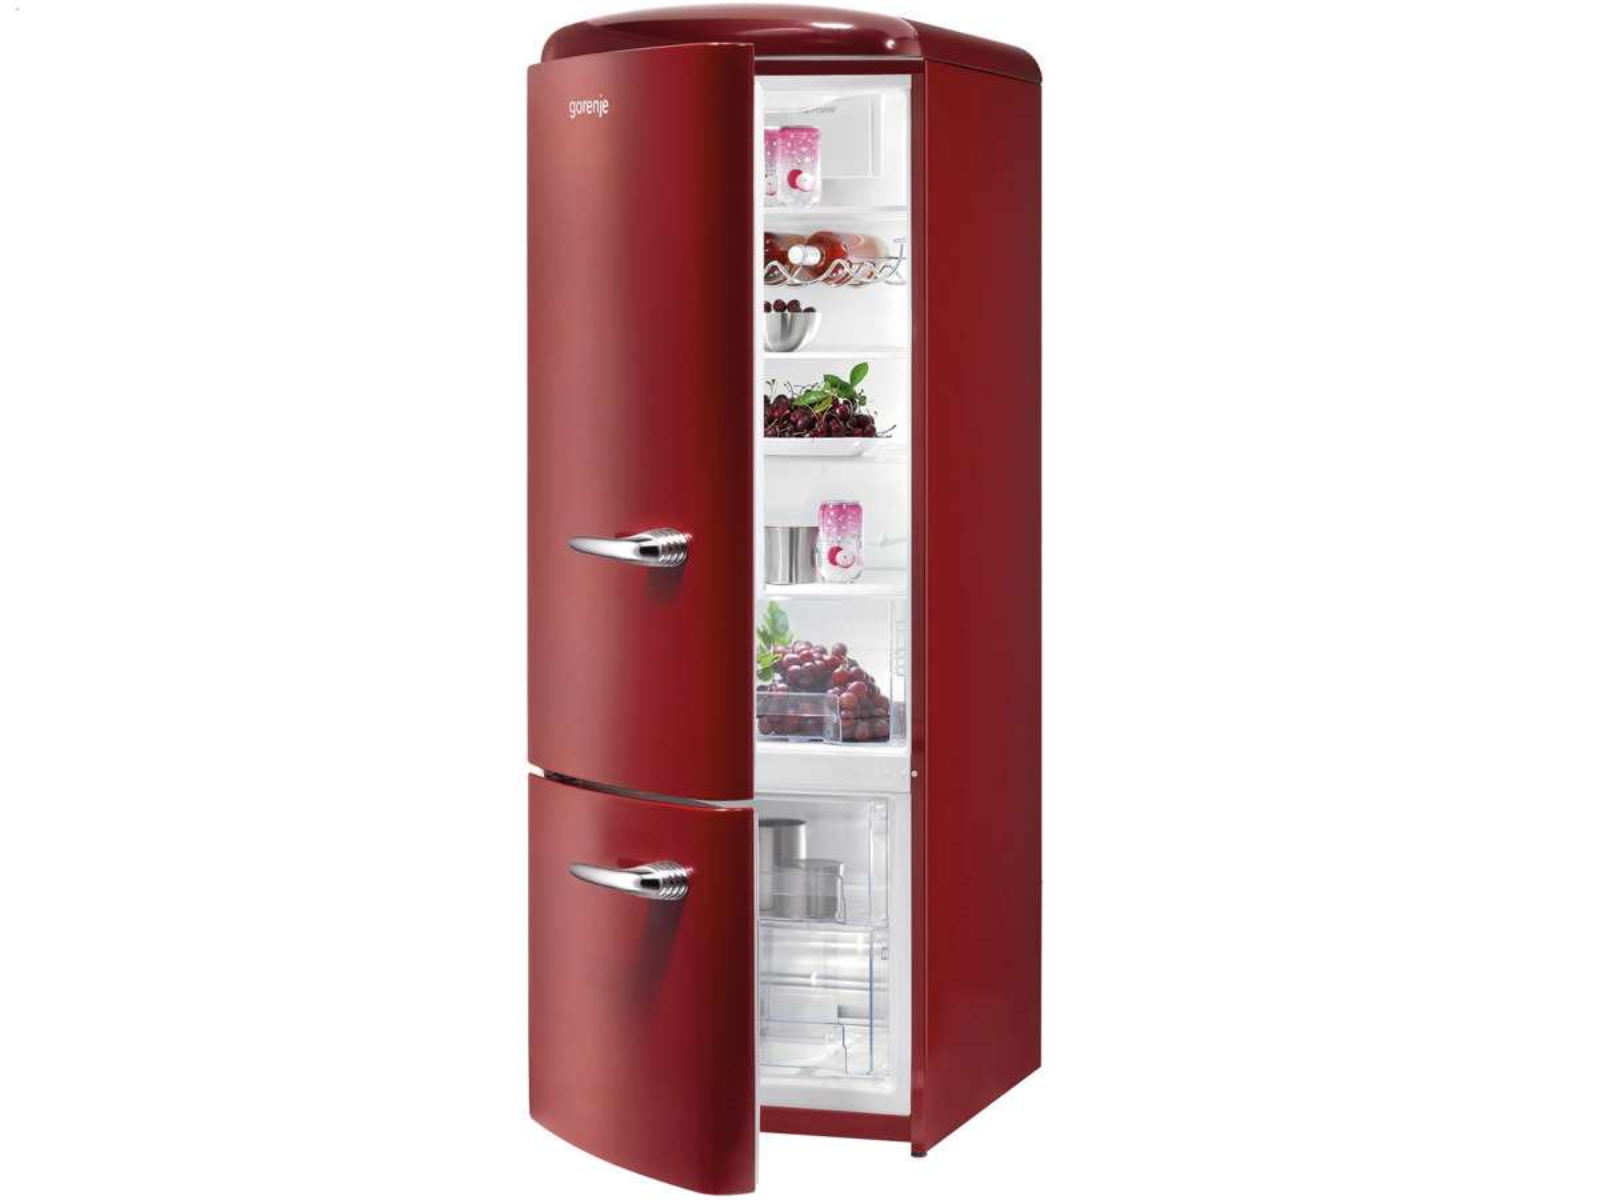 Gorenje Kühlschrank Onrk : Gorenje kühlschrank gefrierkombination kühl gefrierkombination